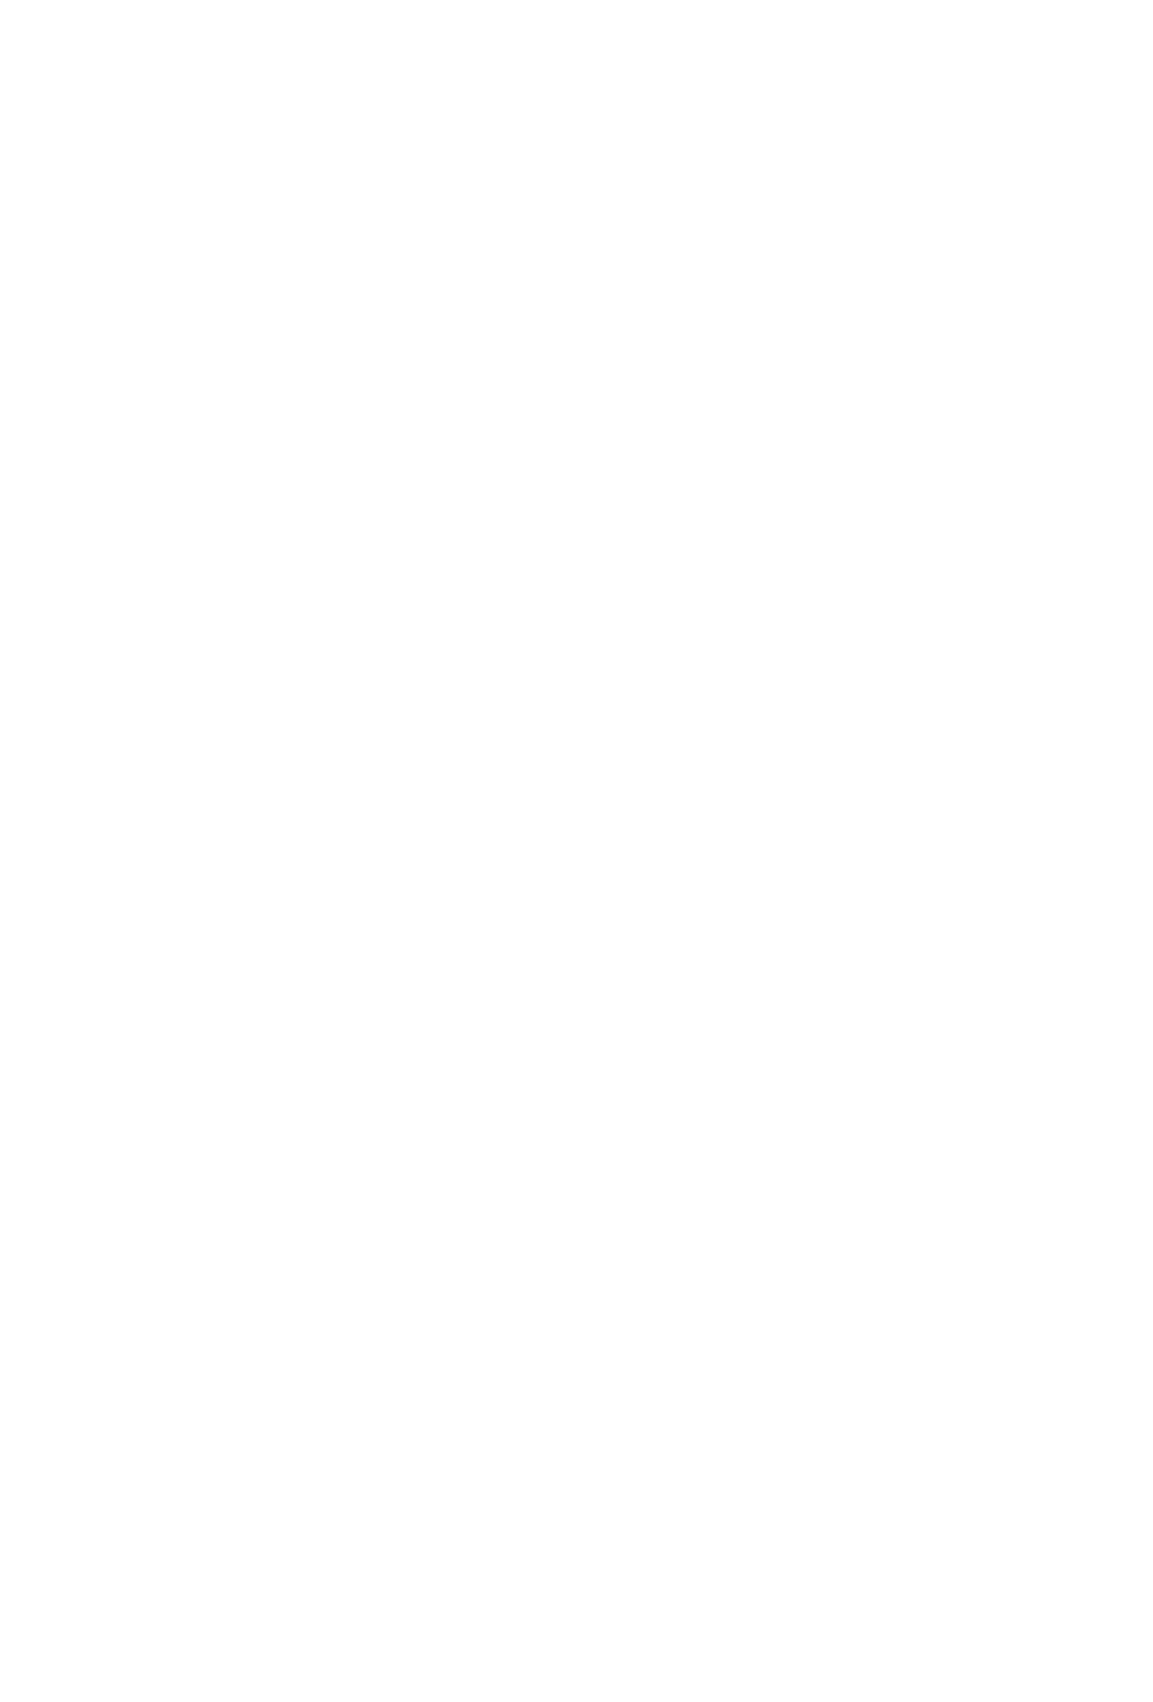 Gcp logo clipart svg transparent stock Press Kit | GCP Applied Technologies svg transparent stock